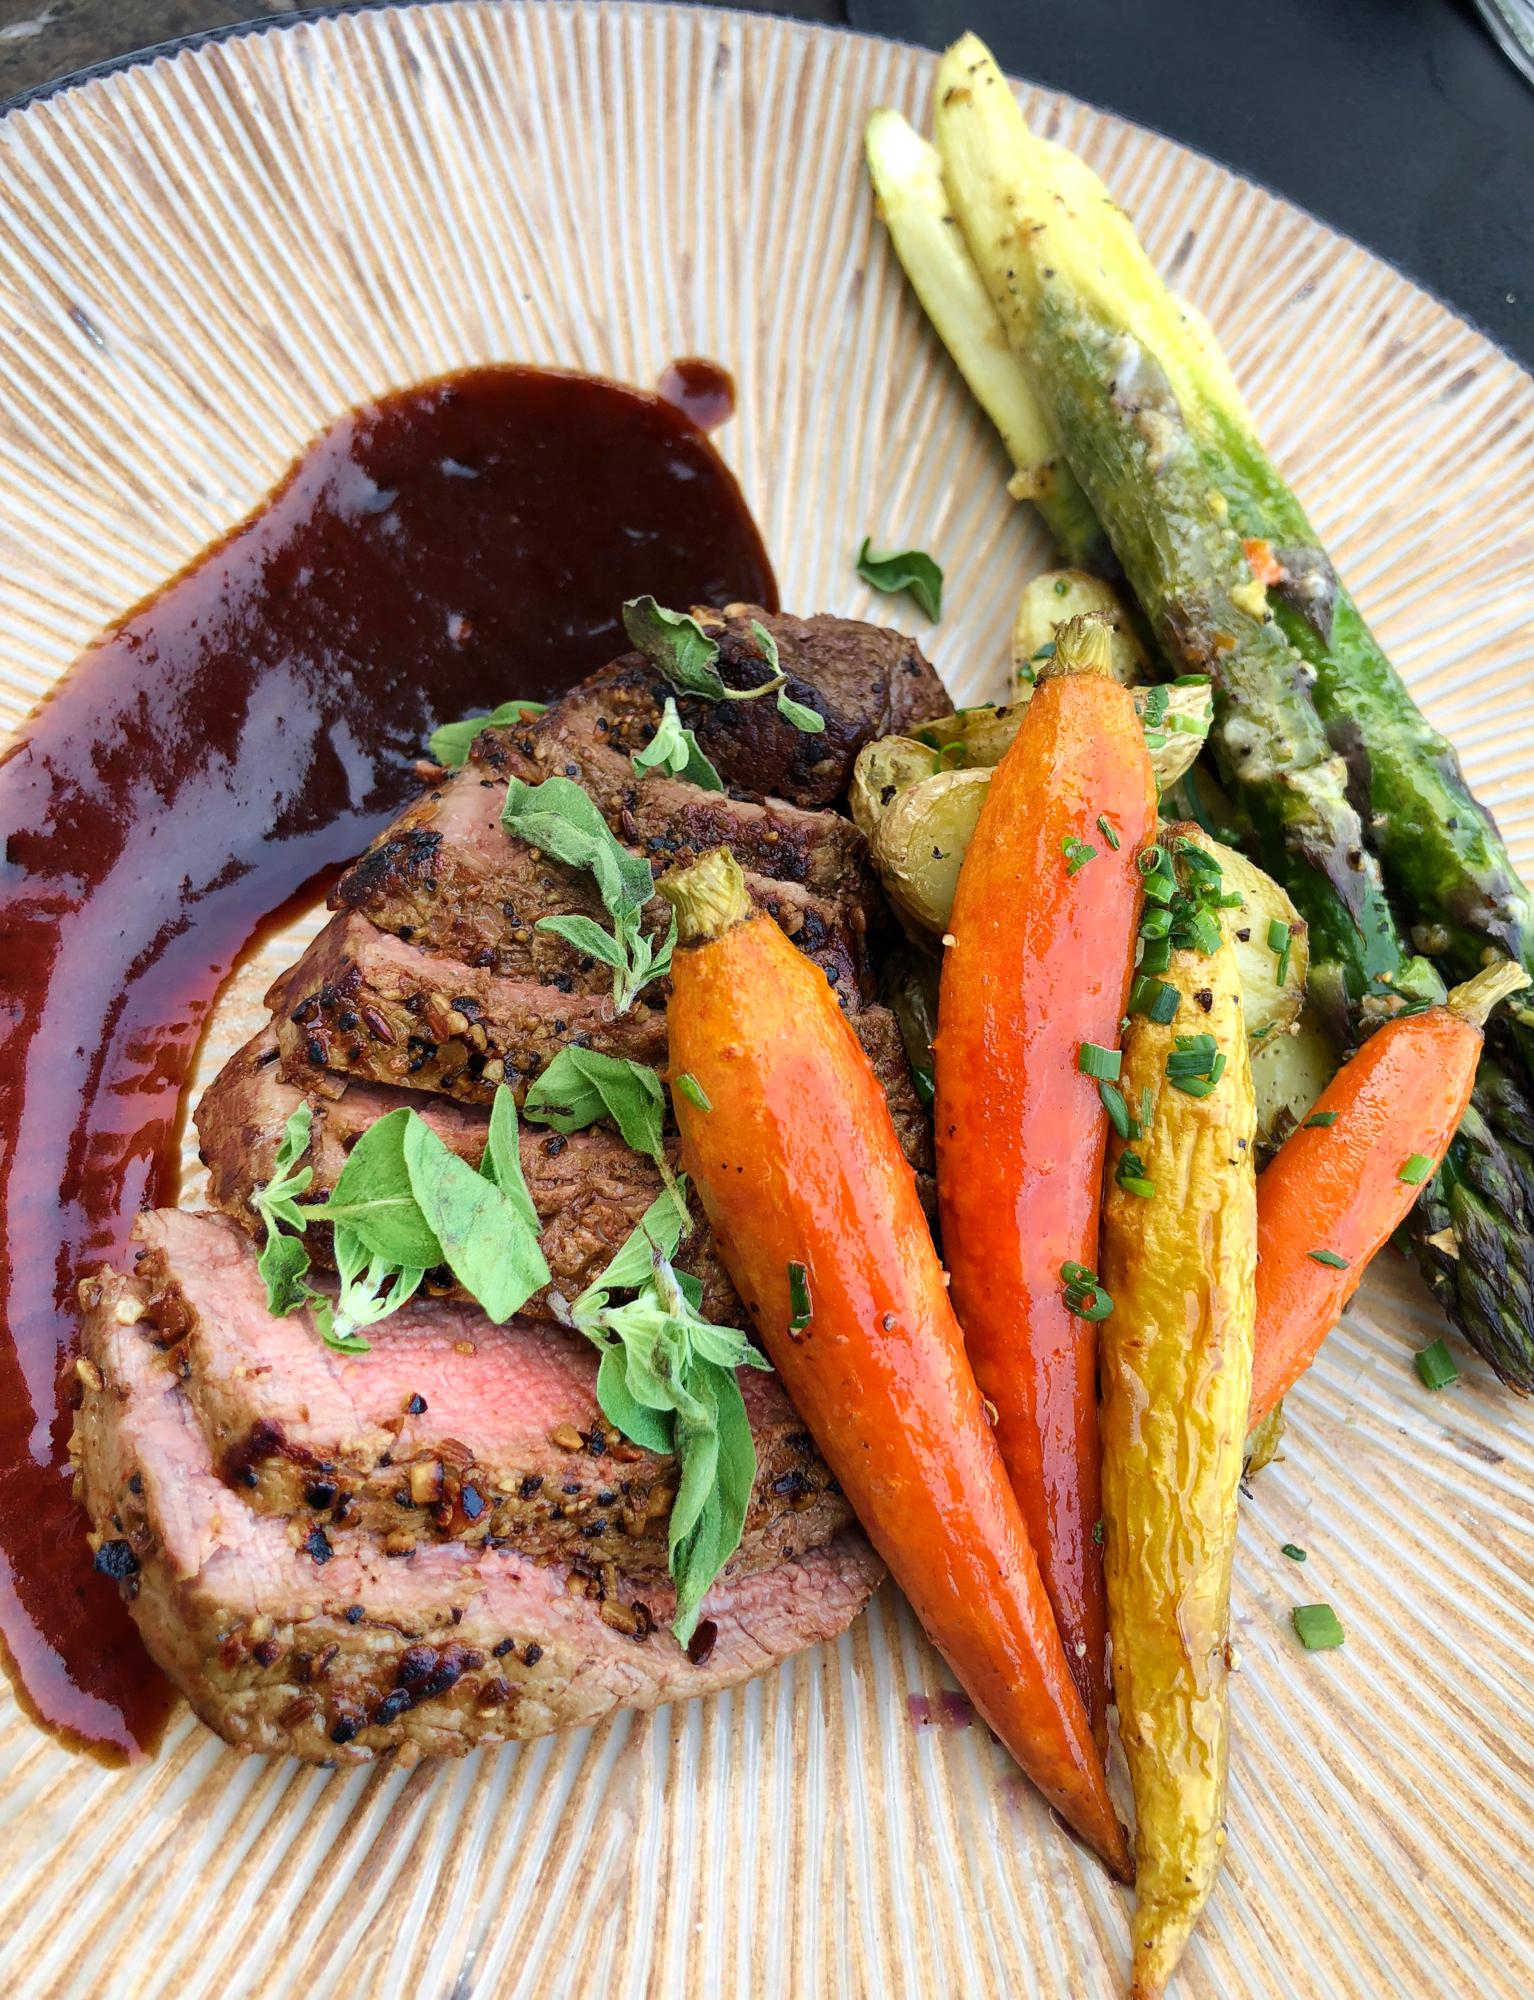 Beef Tenderloin with Port Demi, Honey Roasted Carrots & Garlic Asparagus